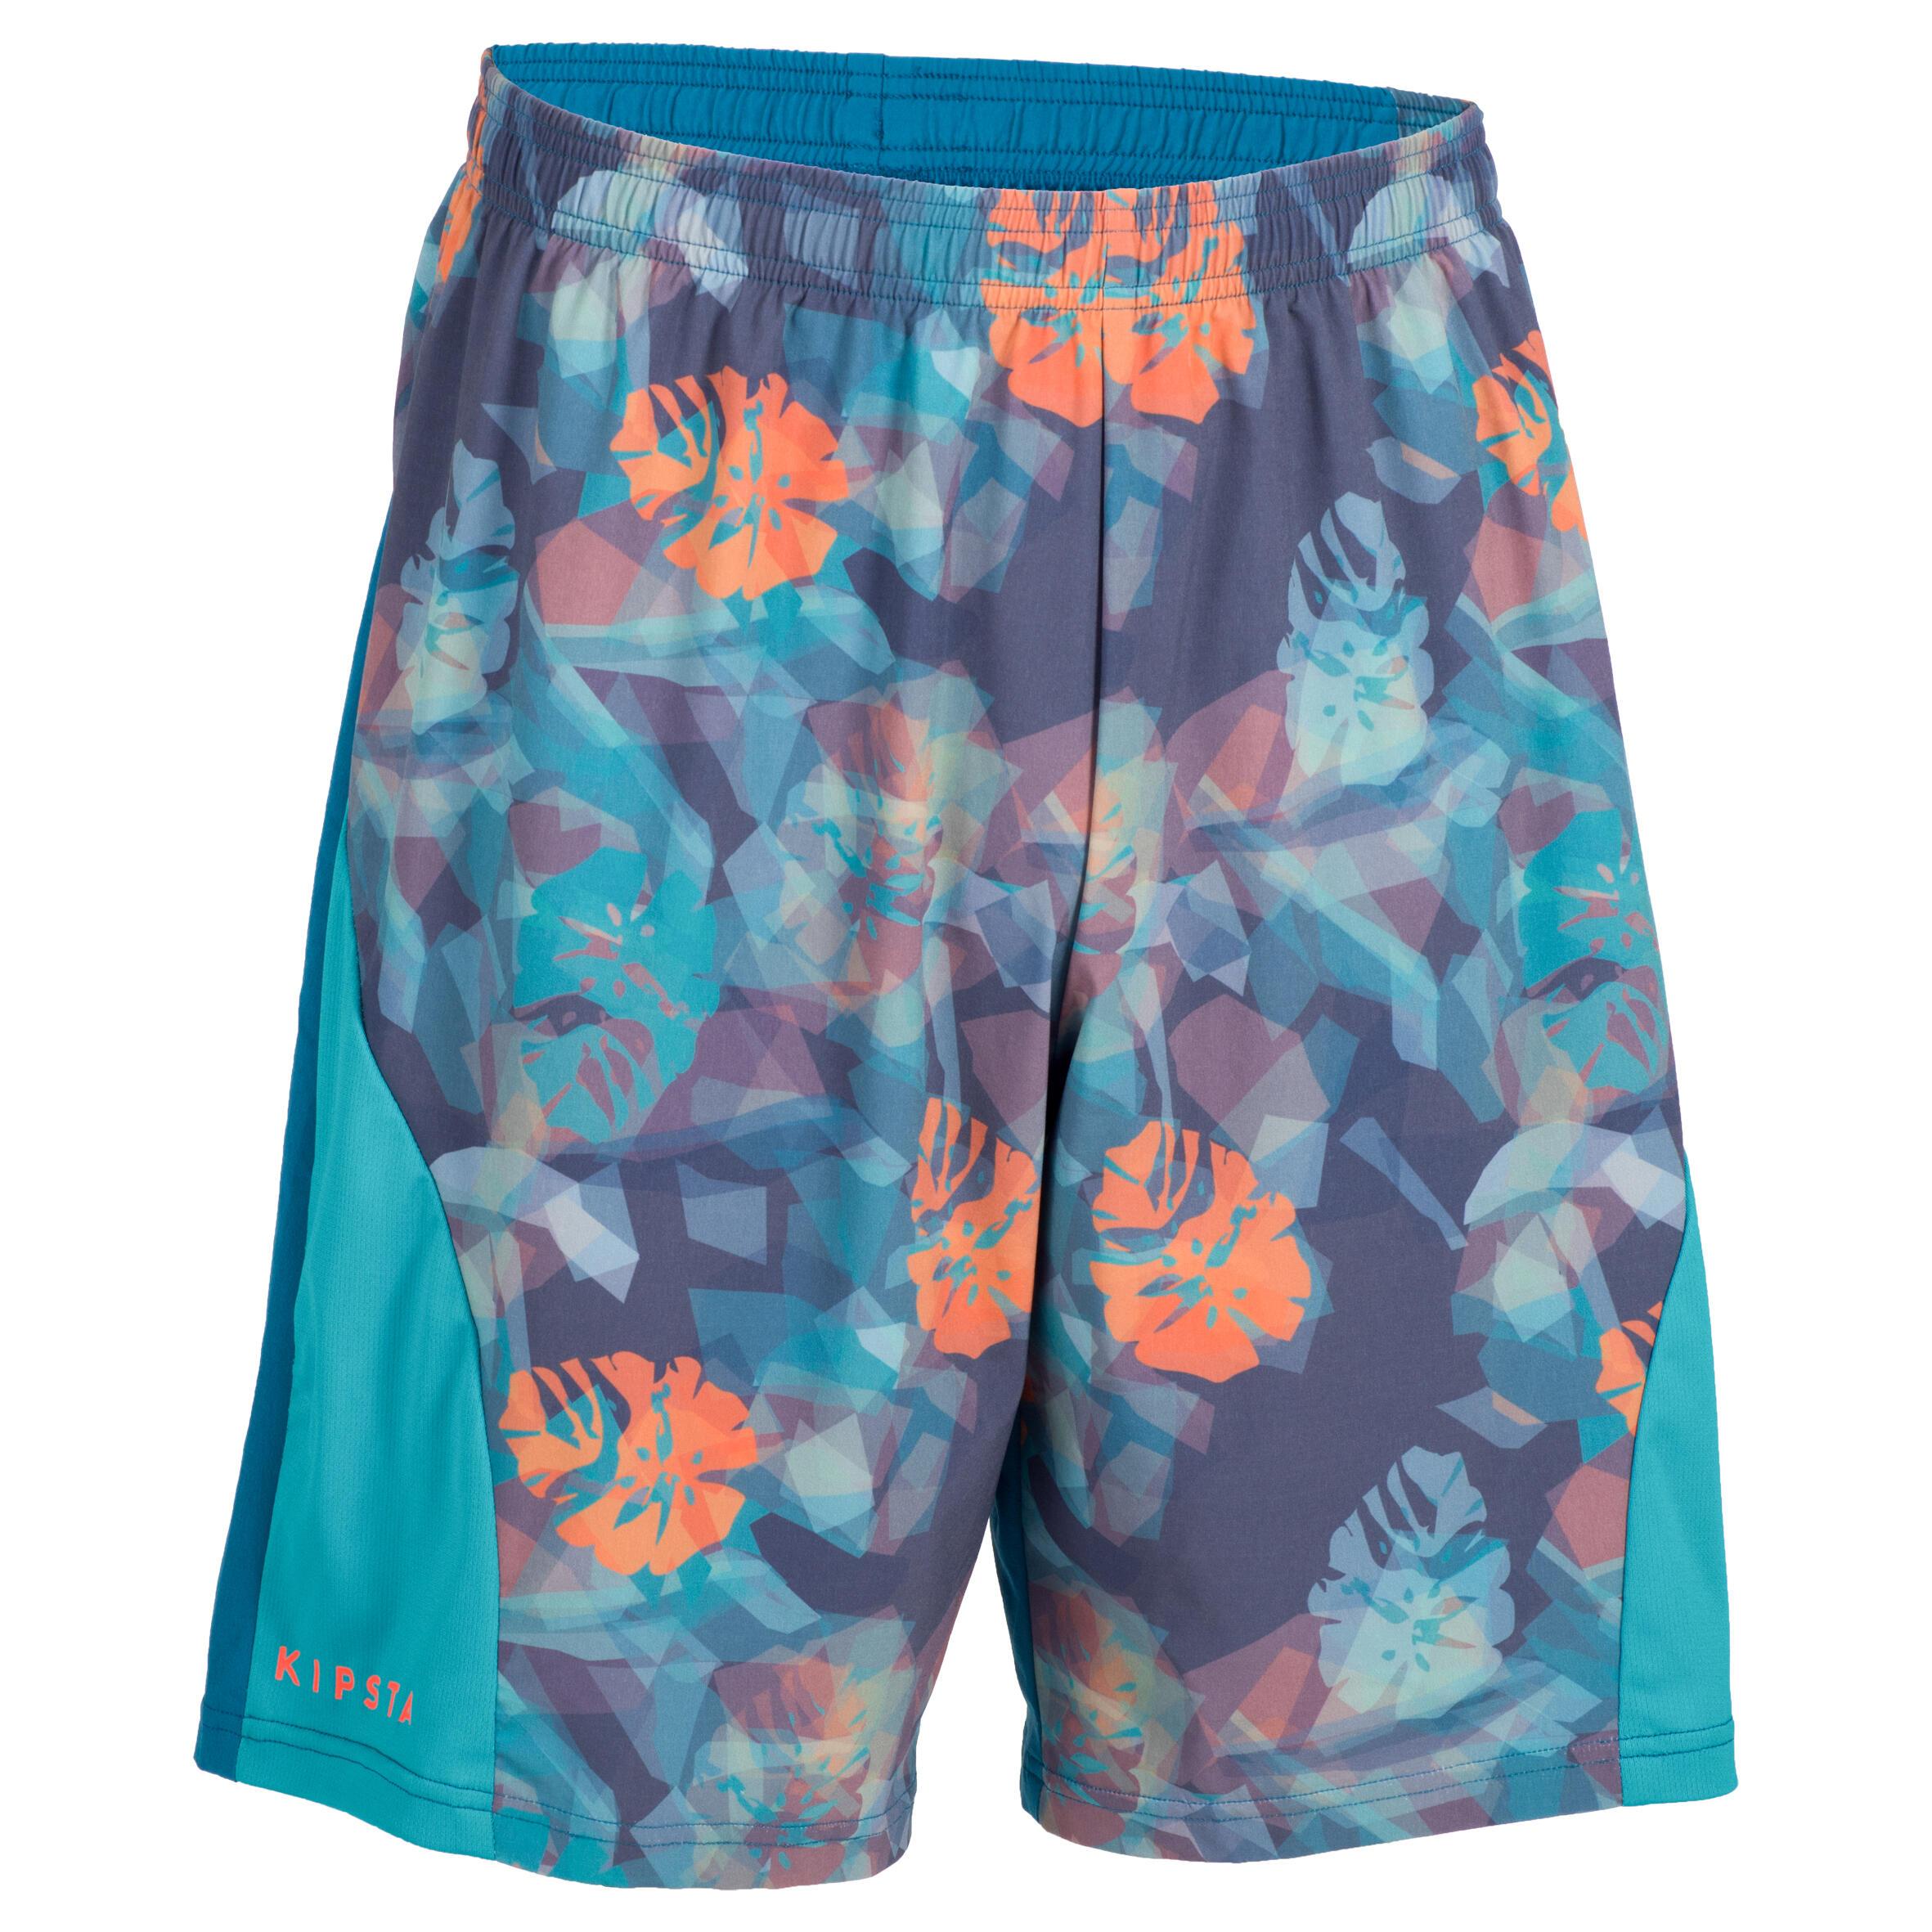 Kipsta Beachvolleybal broekje BV500 heren turquoise